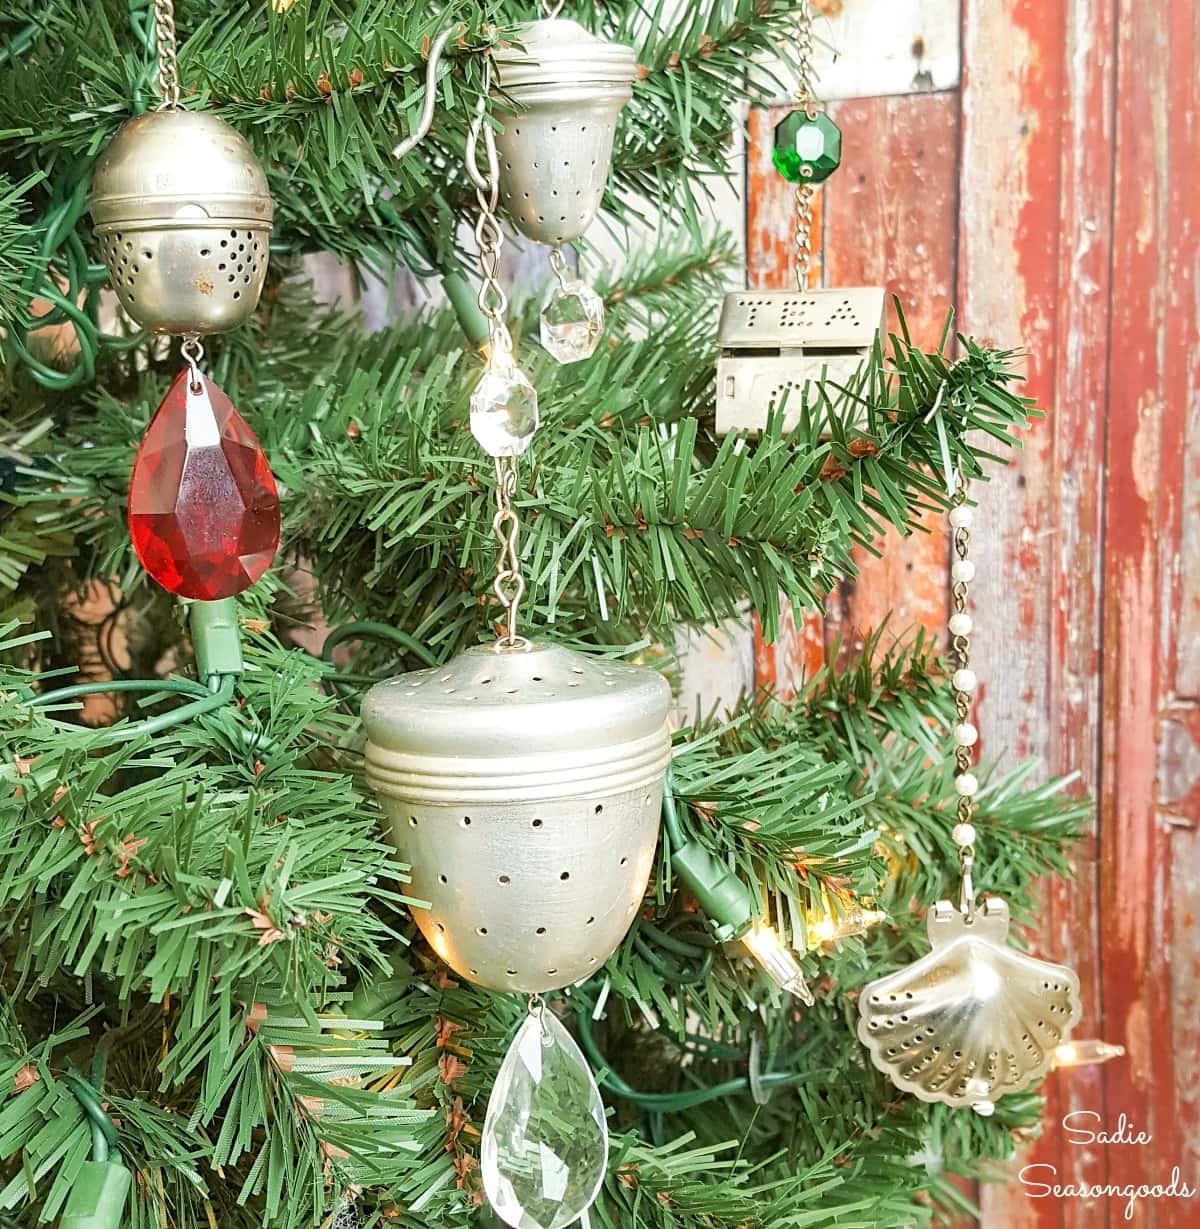 Loose leaf tea strainers as Christmas ornaments